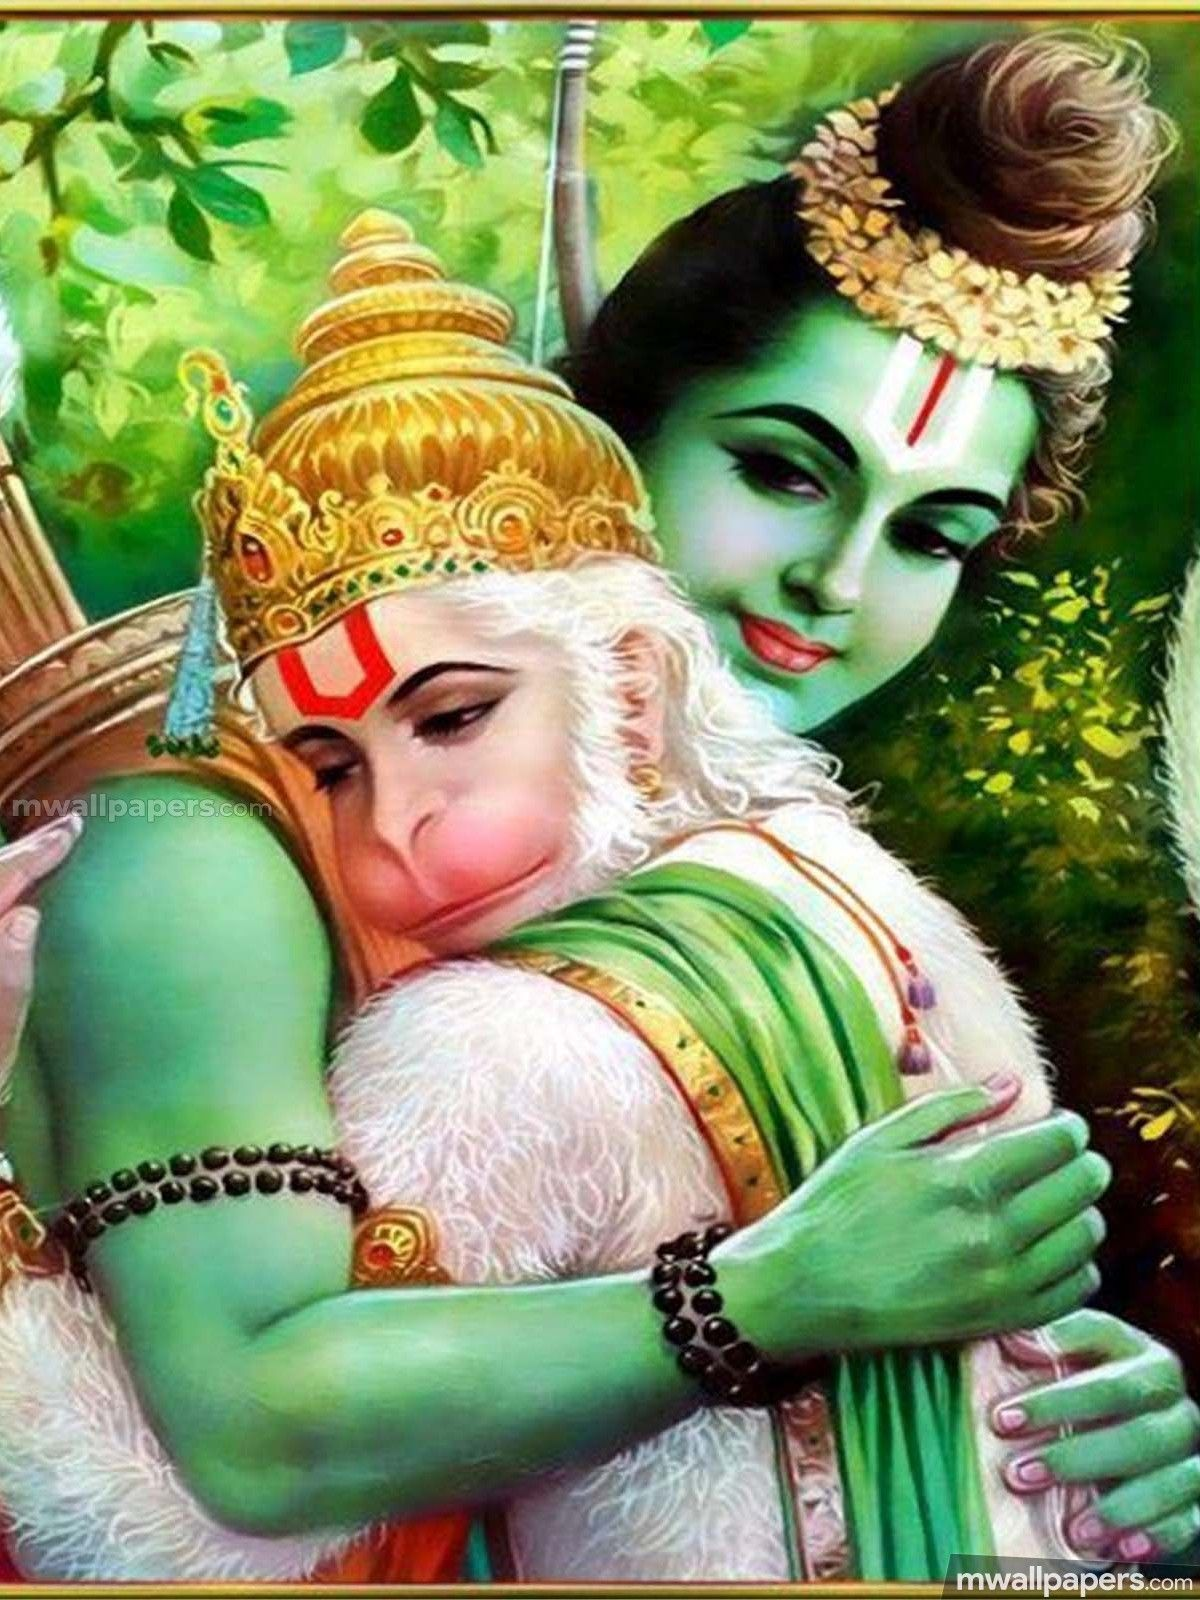 Hanuman Anjaneya Hd Wallpapers Images 1080p 11852 Hanuman Anjaneya Anjaneyar God Hindugod Maruthi Ram Hanuman Hanumanji Hanuman Wallpaper full hd hd 1080p lord hanuman